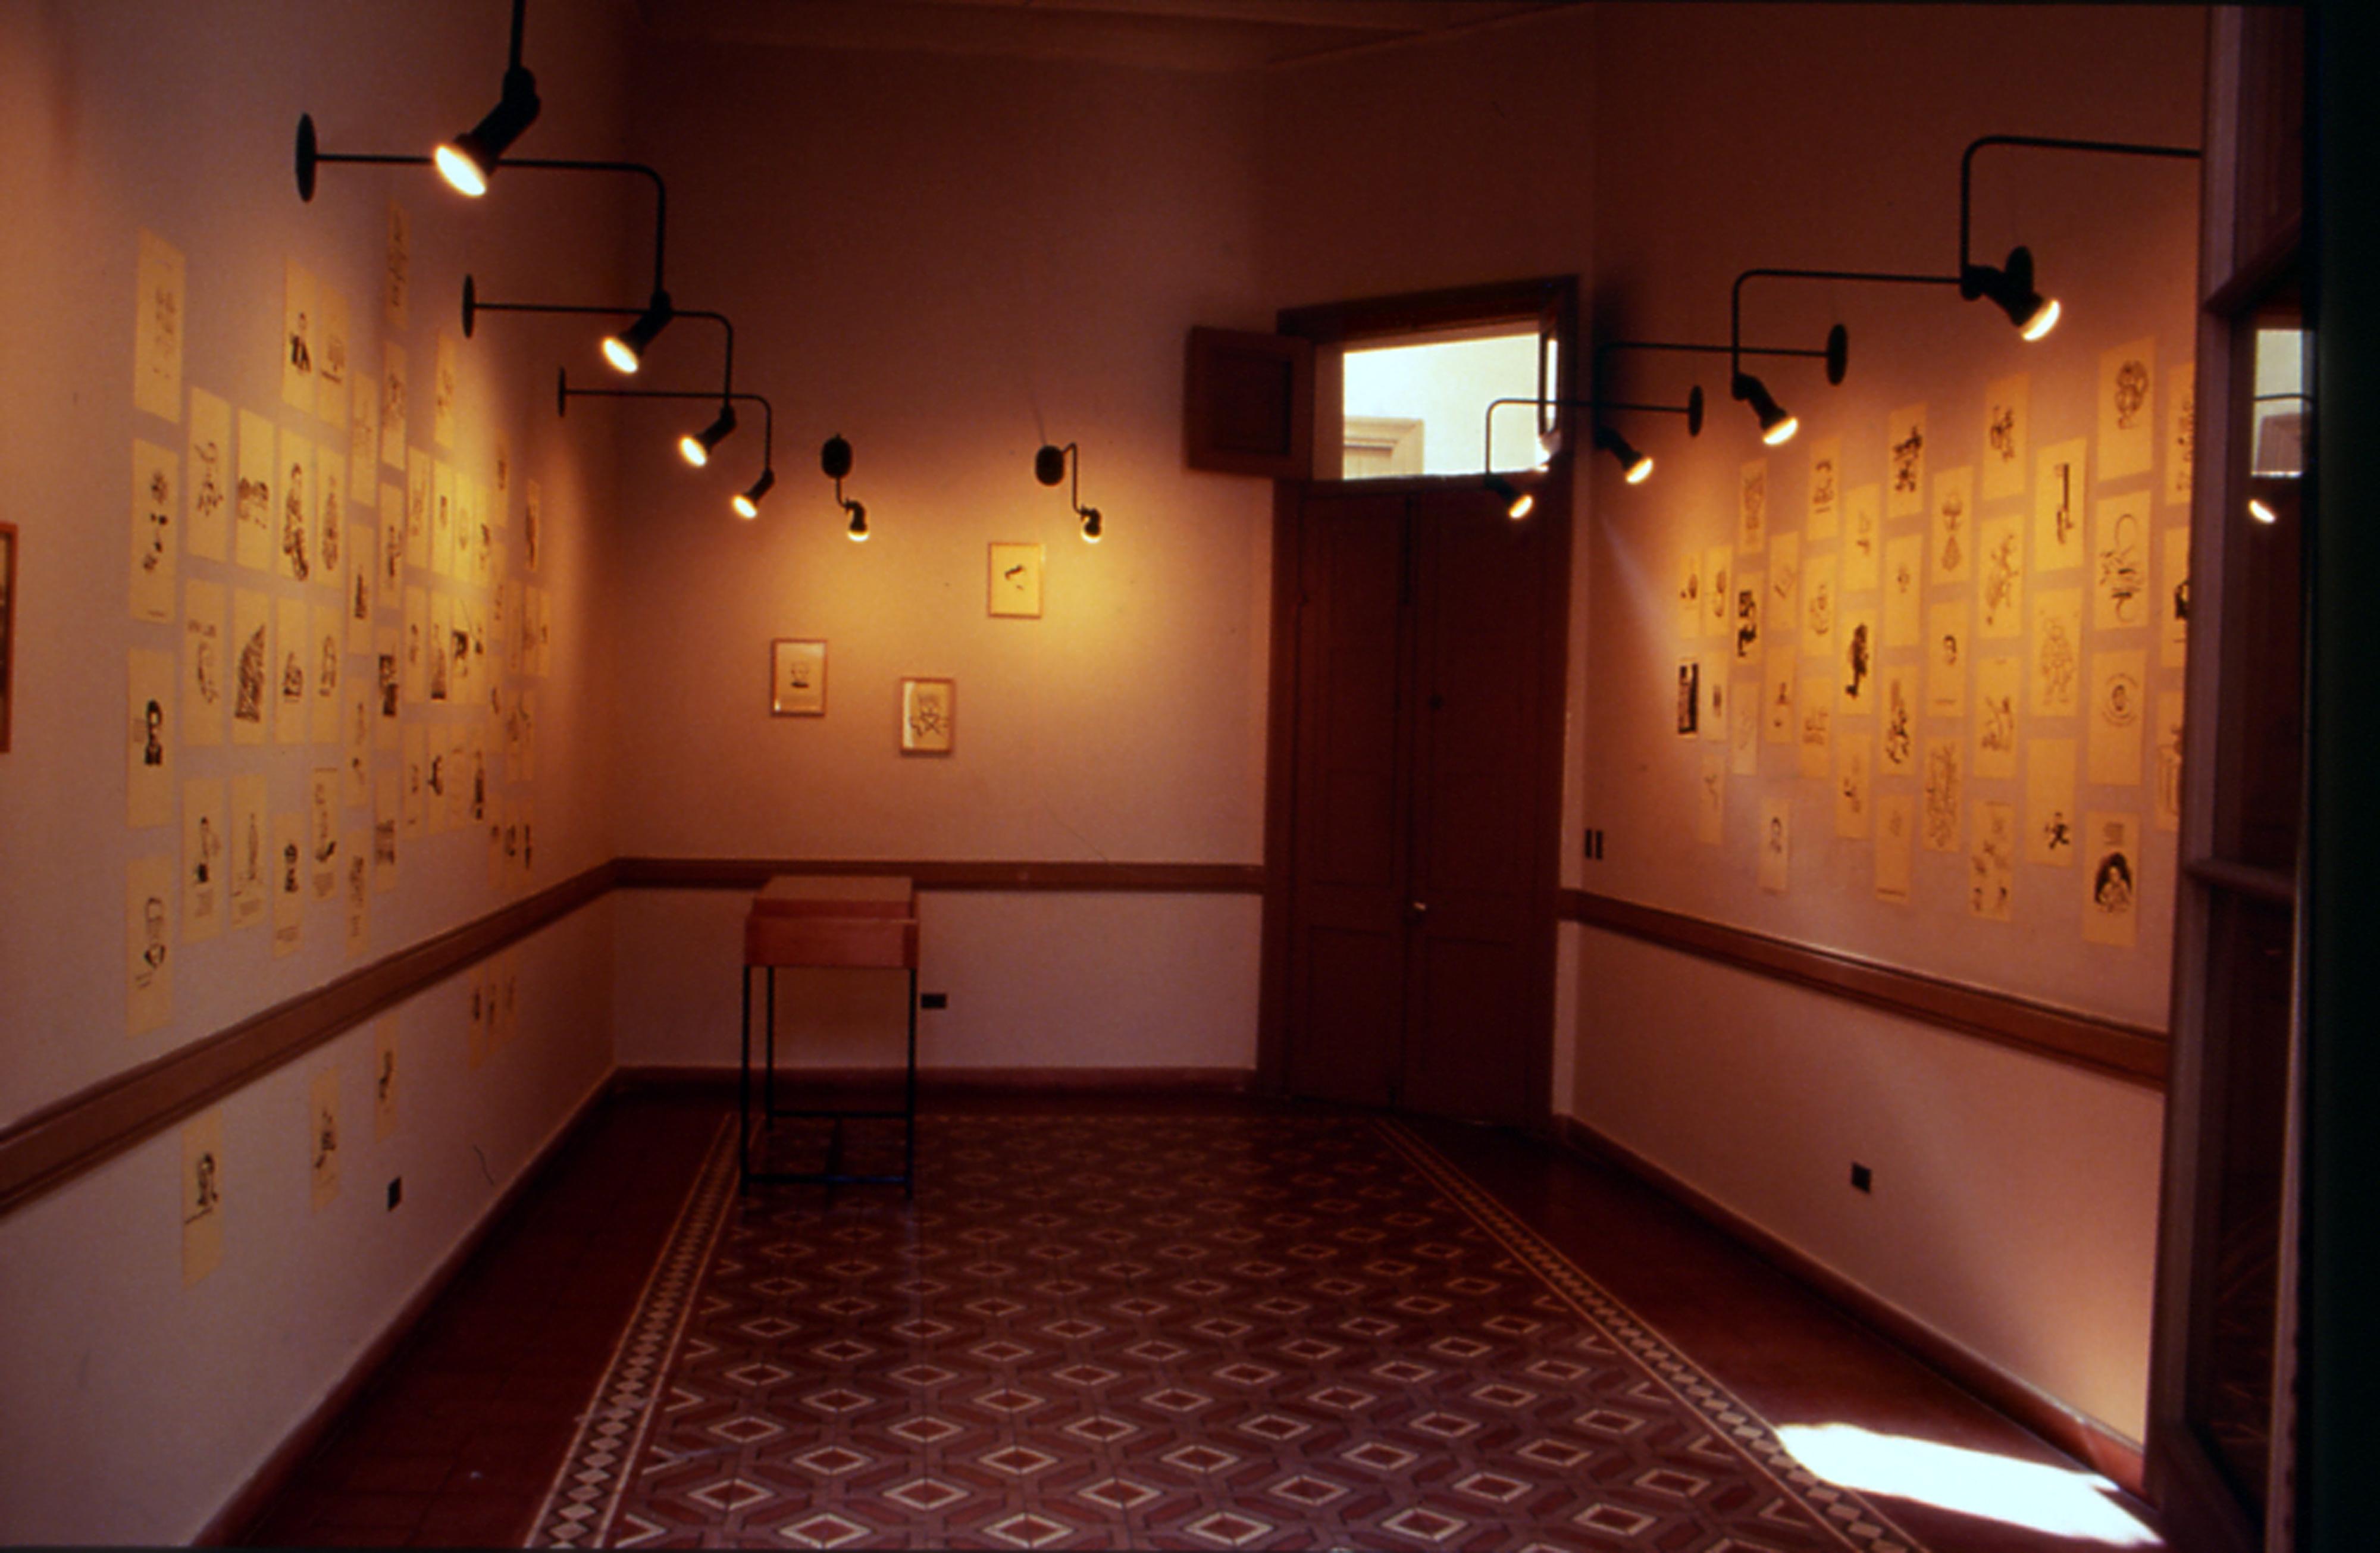 Galerie Barbara Thumm \ Fernando Bryce